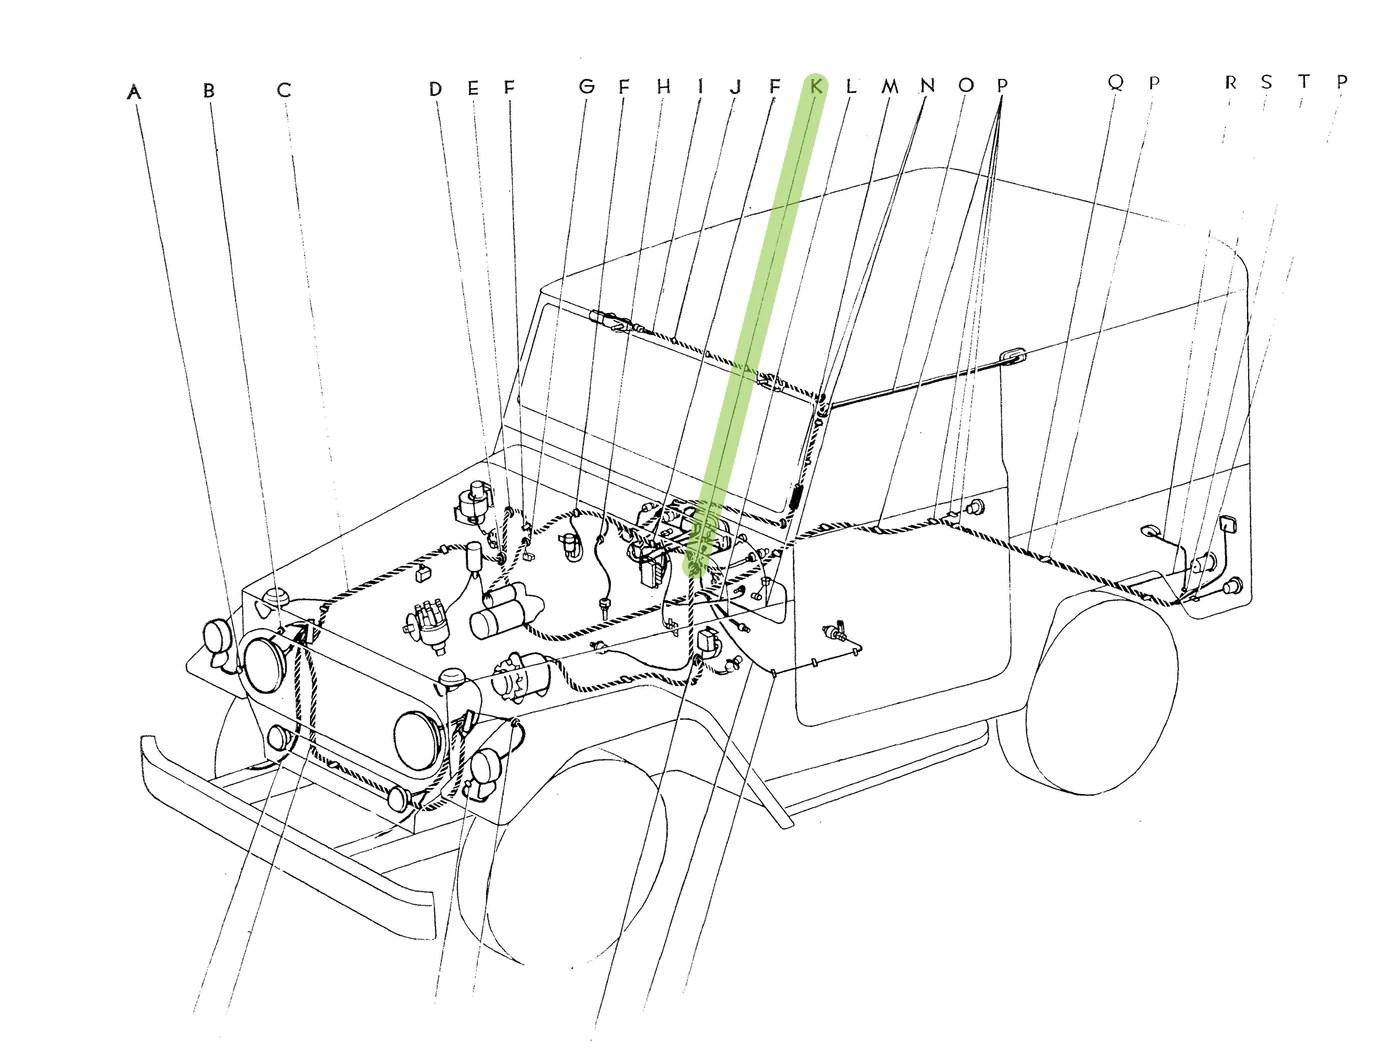 hight resolution of wiring diagram grommet key wiring diagram img firewall grommet wire harness oem fj40 fj45